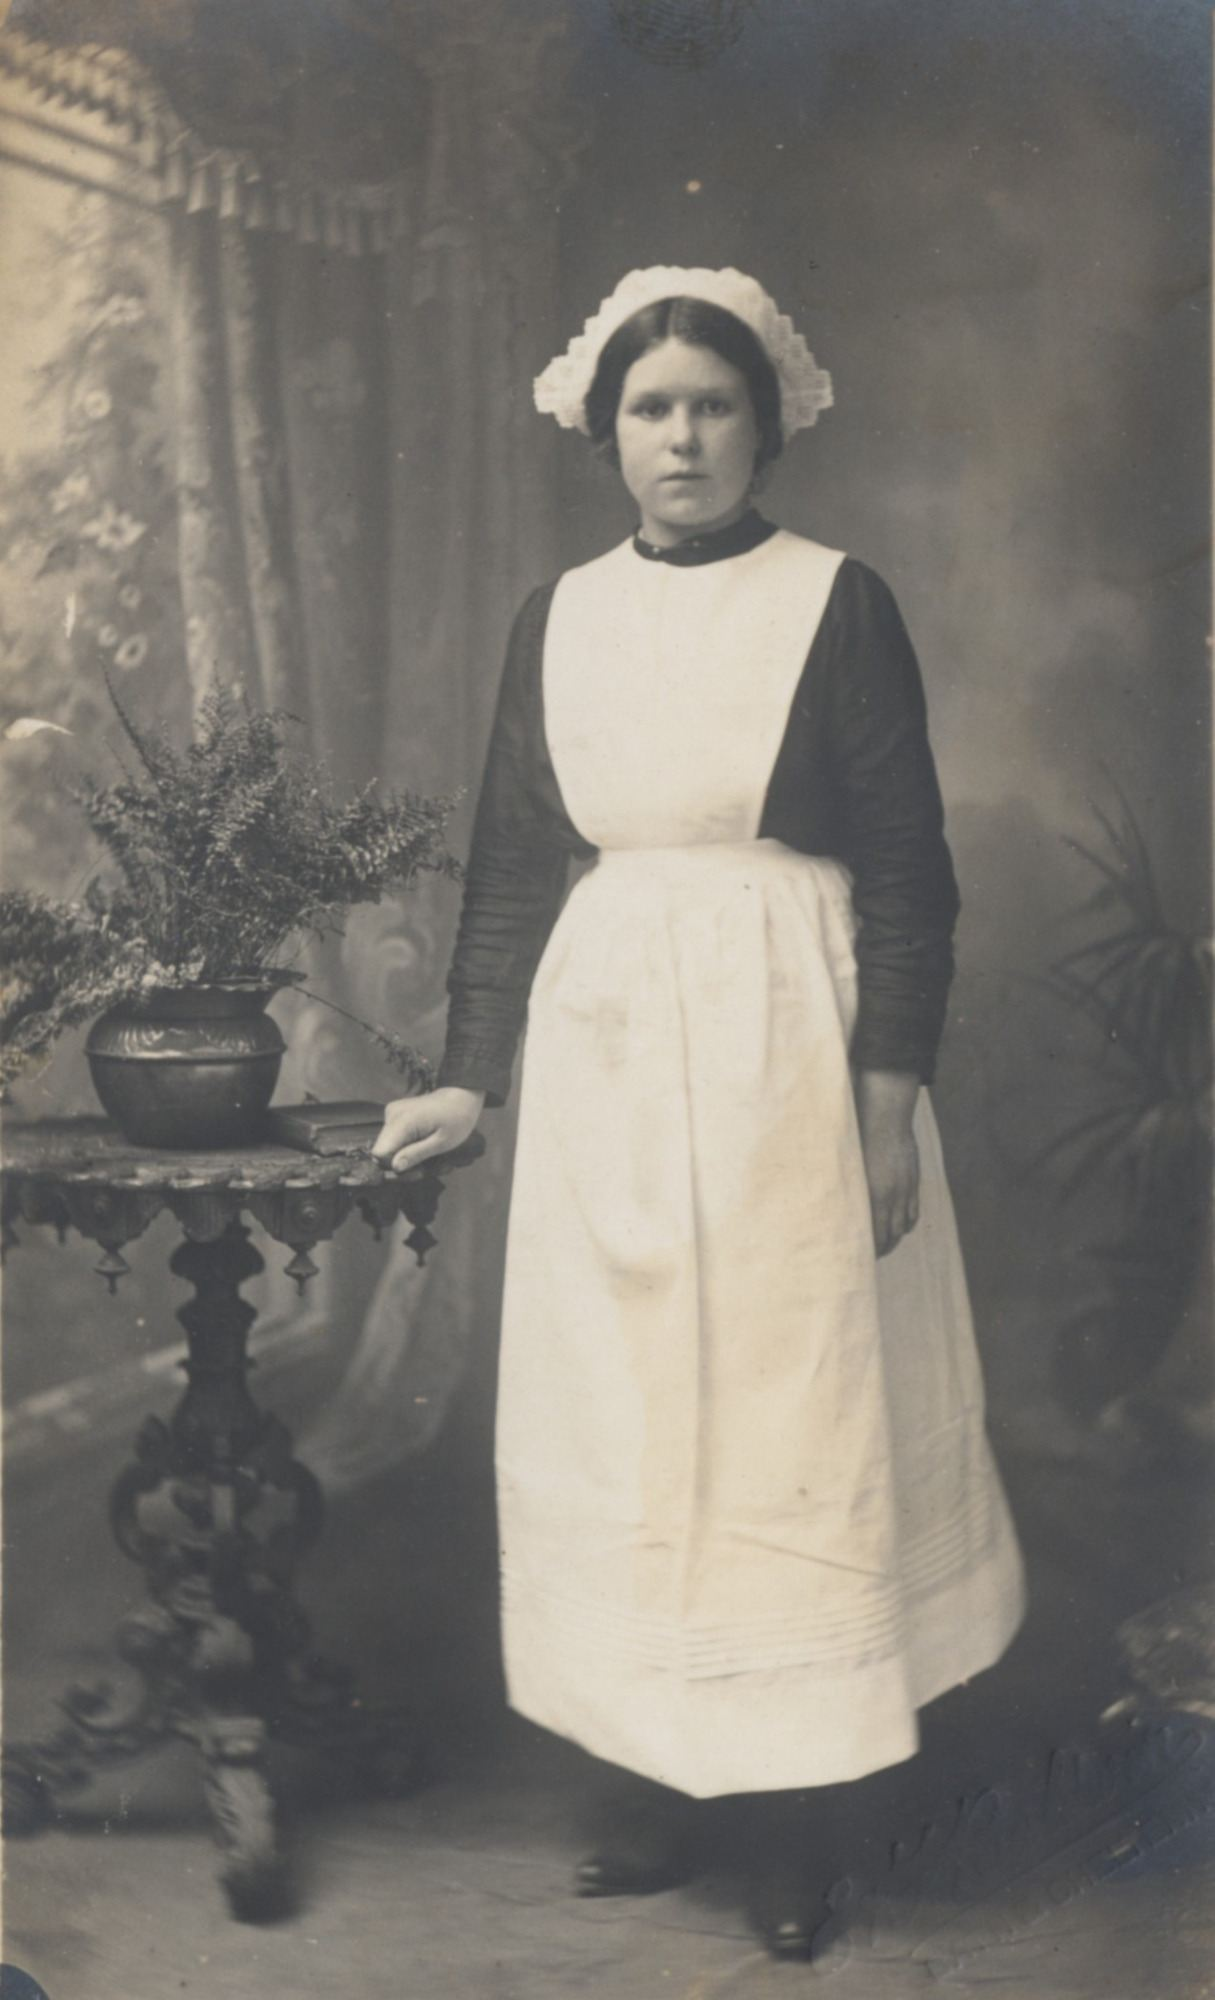 Postcard of 'Grandma's maid, Ada', circa 1905